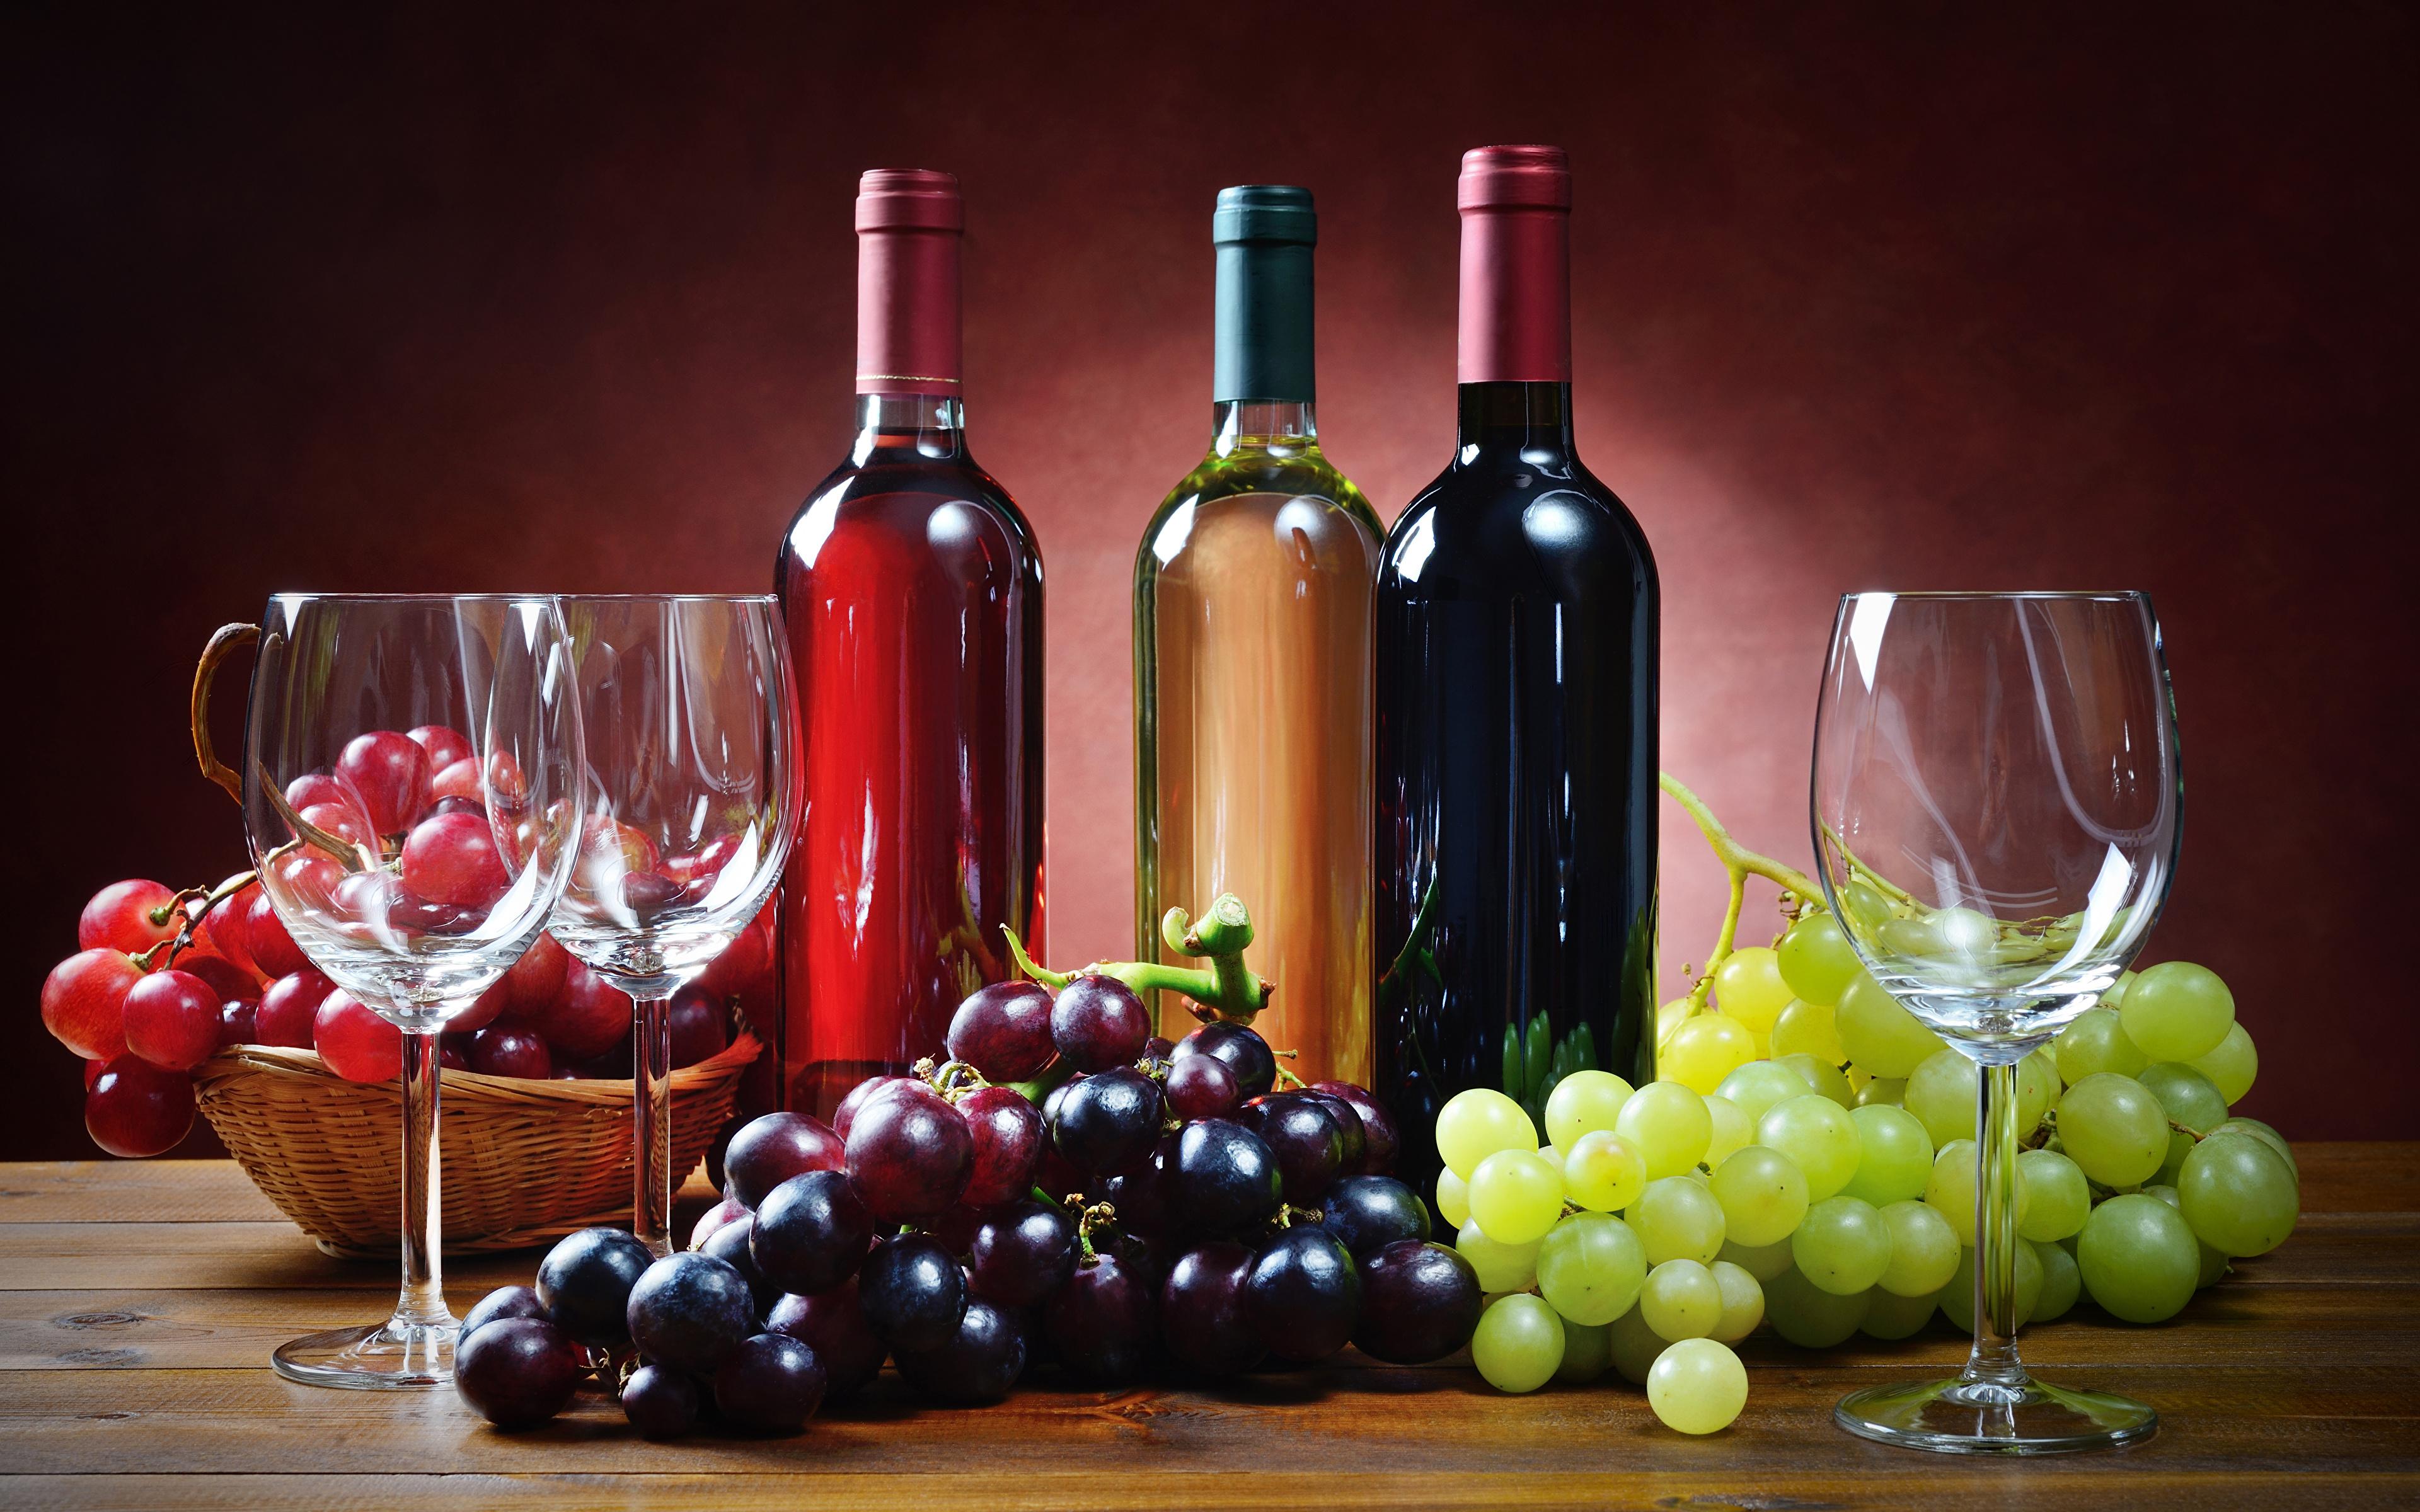 https://s1.1zoom.ru/b5050/102/Still-life_Wine_Grapes_Bottle_Stemware_Multicolor_540685_3840x2400.jpg